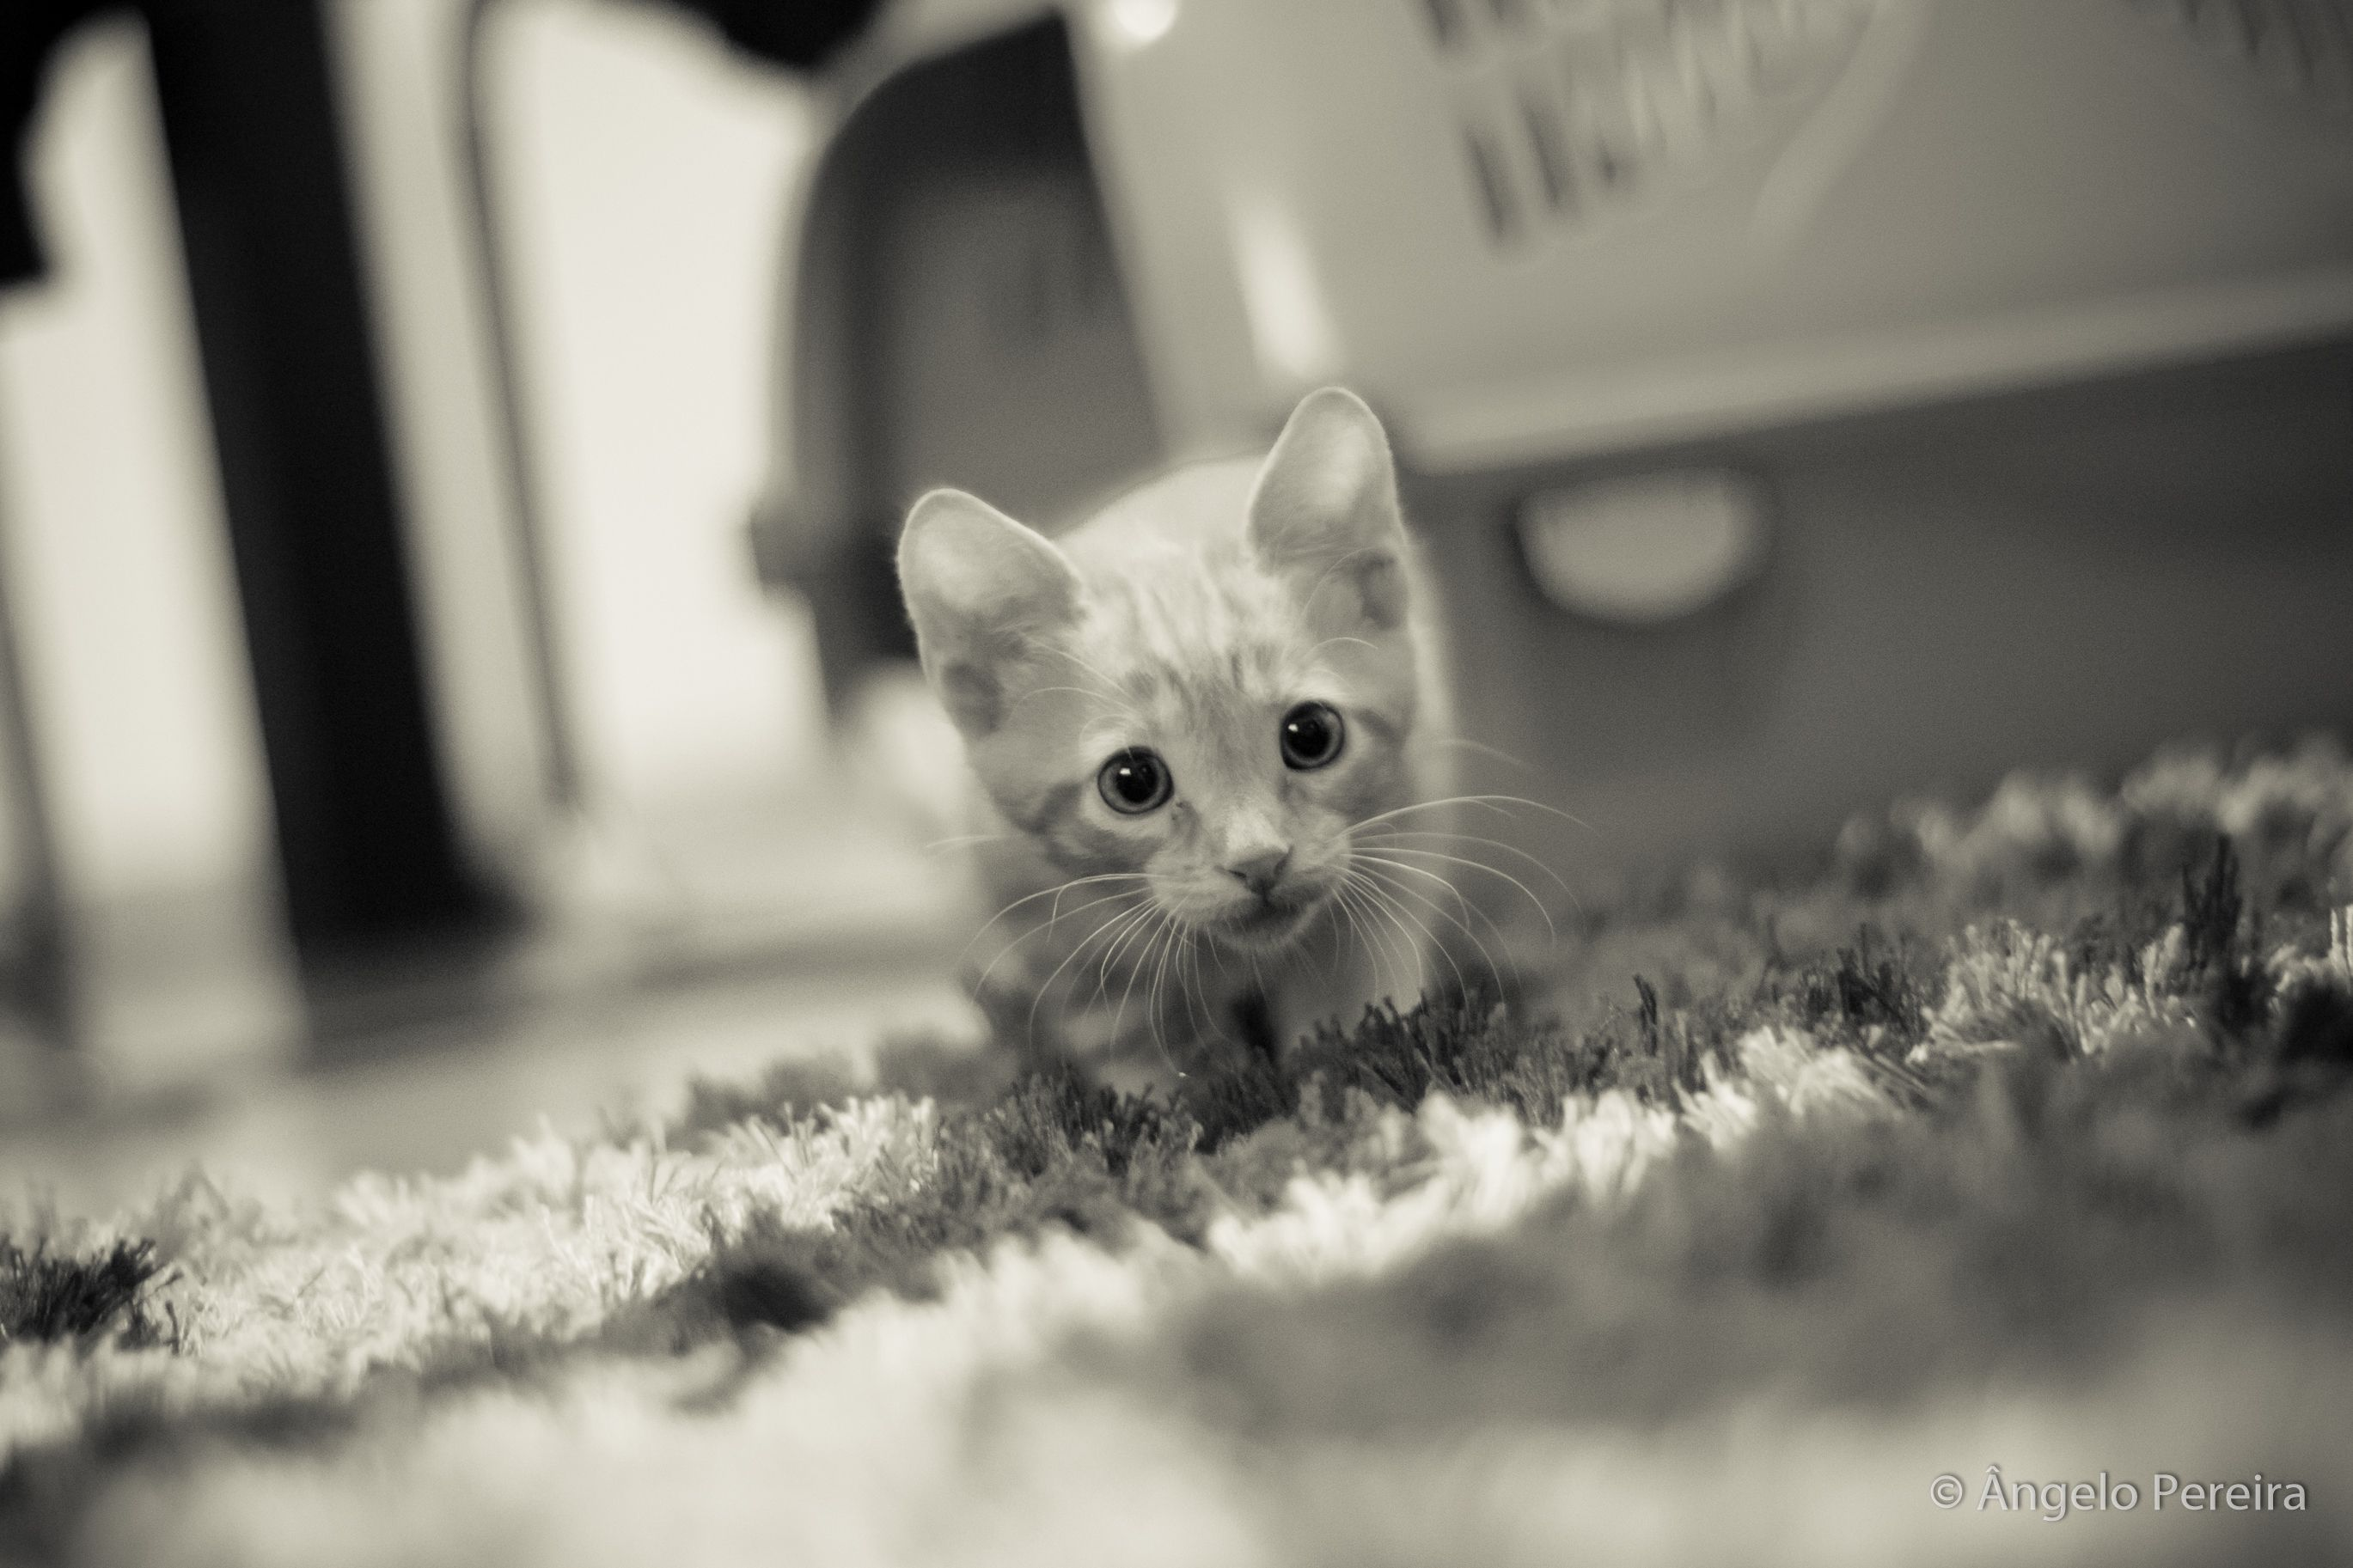 #Baby #Cat #BabyCat #Kitten